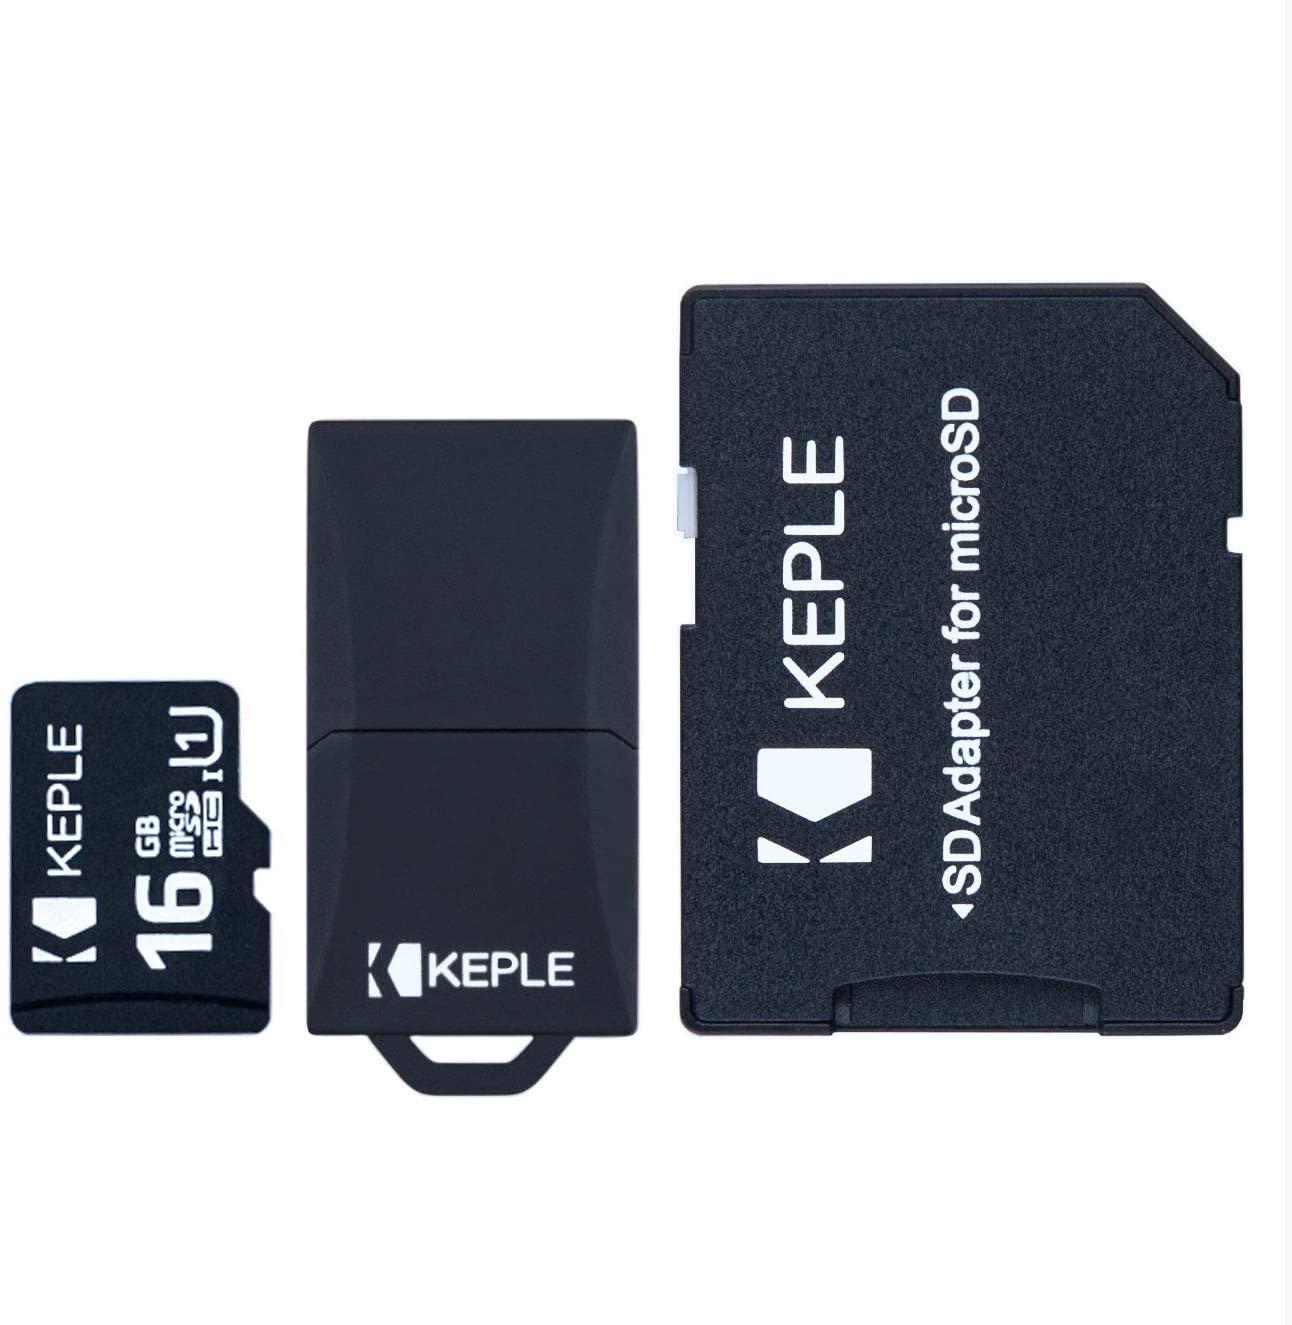 32GB microSD Memory Card | Micro SD Class 10 Compatible with LG K4, K7, K8 K10, Ray, G2 Mini, G3, G4, G4c, G5, LG G6, LG X Screen, LG X Cam Mobile Phone | 32 GB